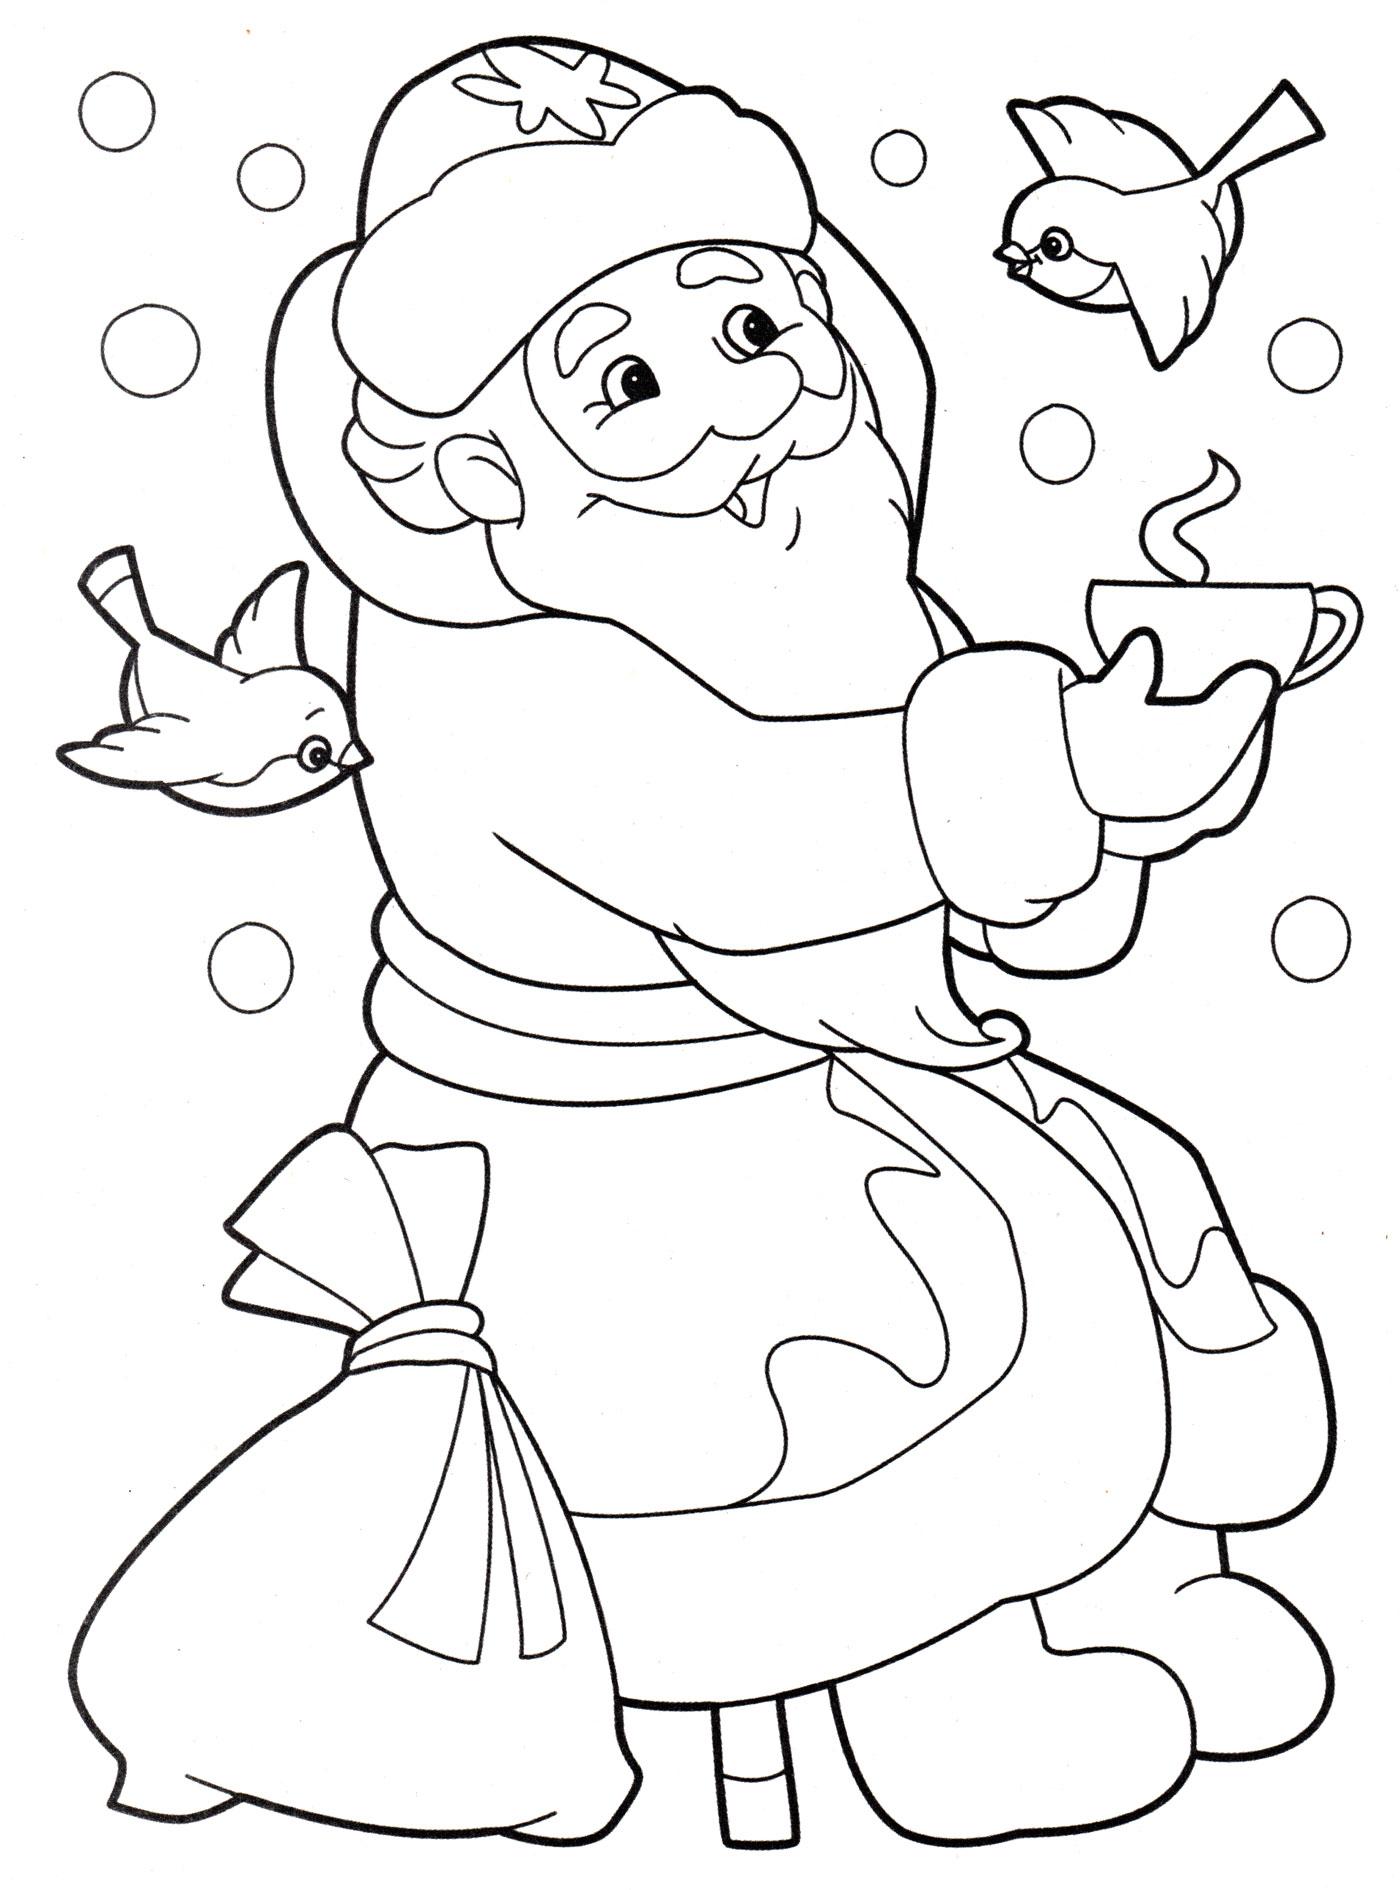 Раскраска Дед мороз пьет чай